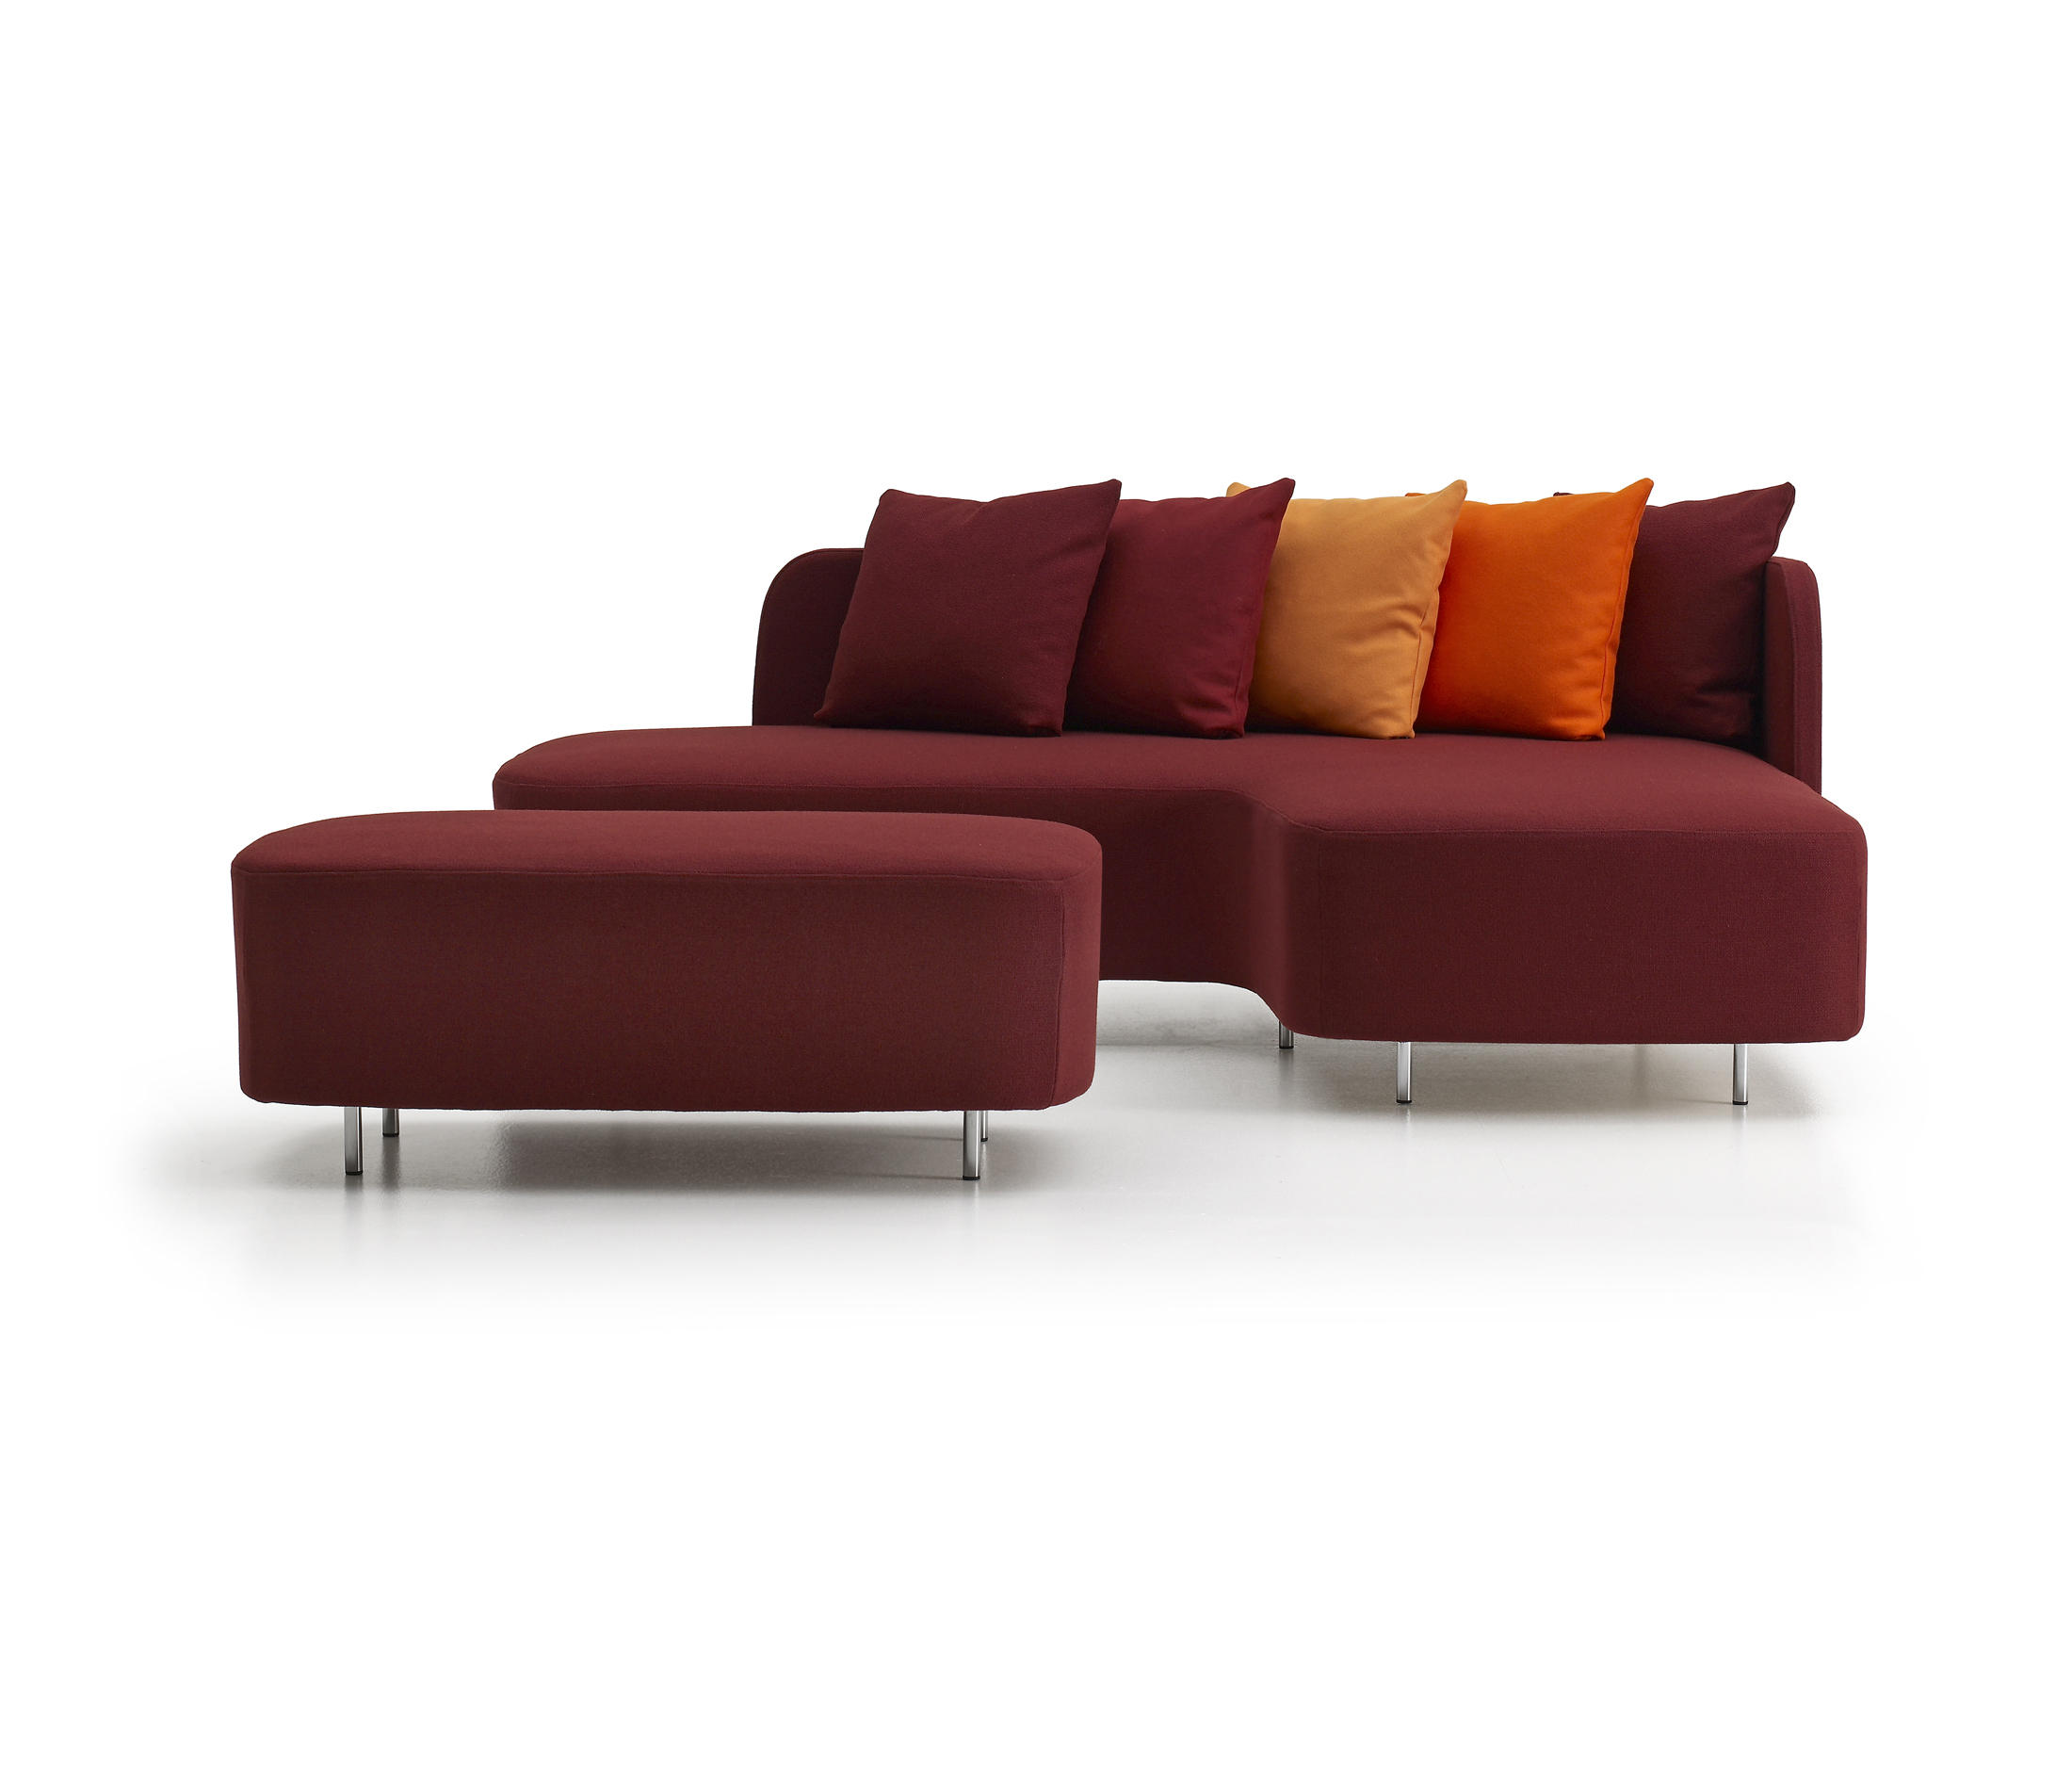 minima corner sofa by offecct - Bergroer Sessel Und Ottomane